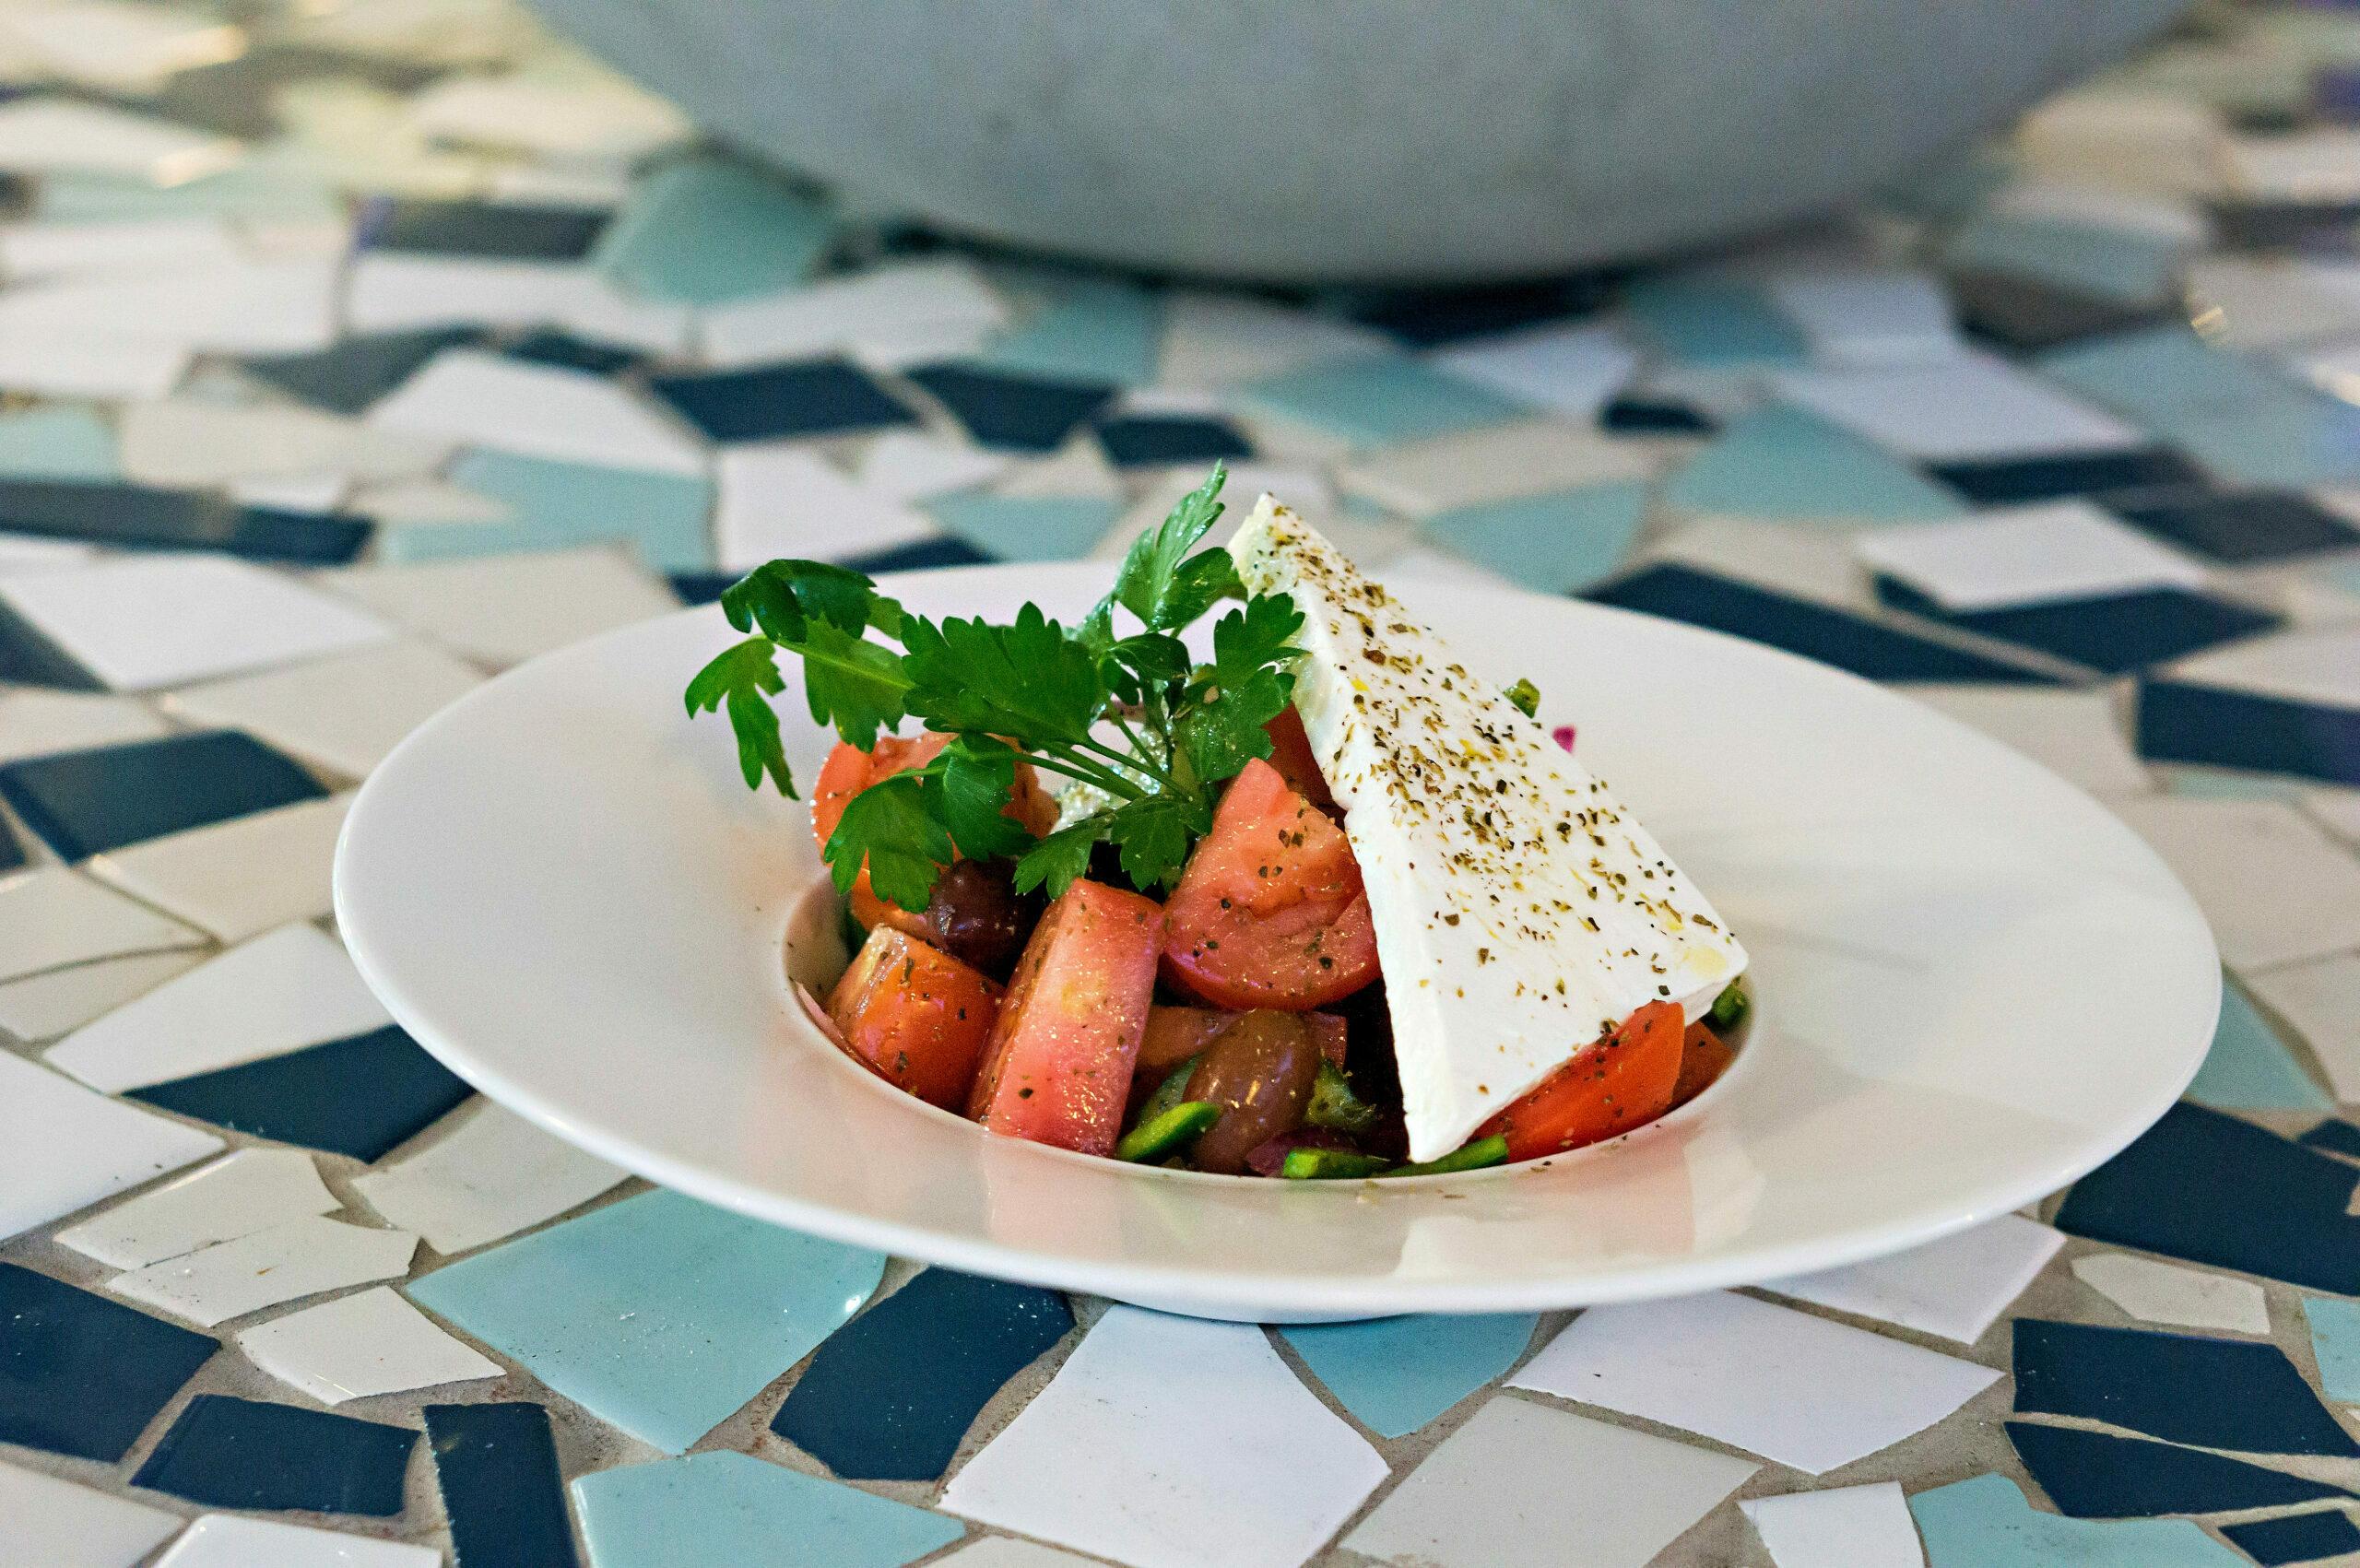 Selected Field Ripe Tomato Salad - Barrel Aged Dodonis Feta